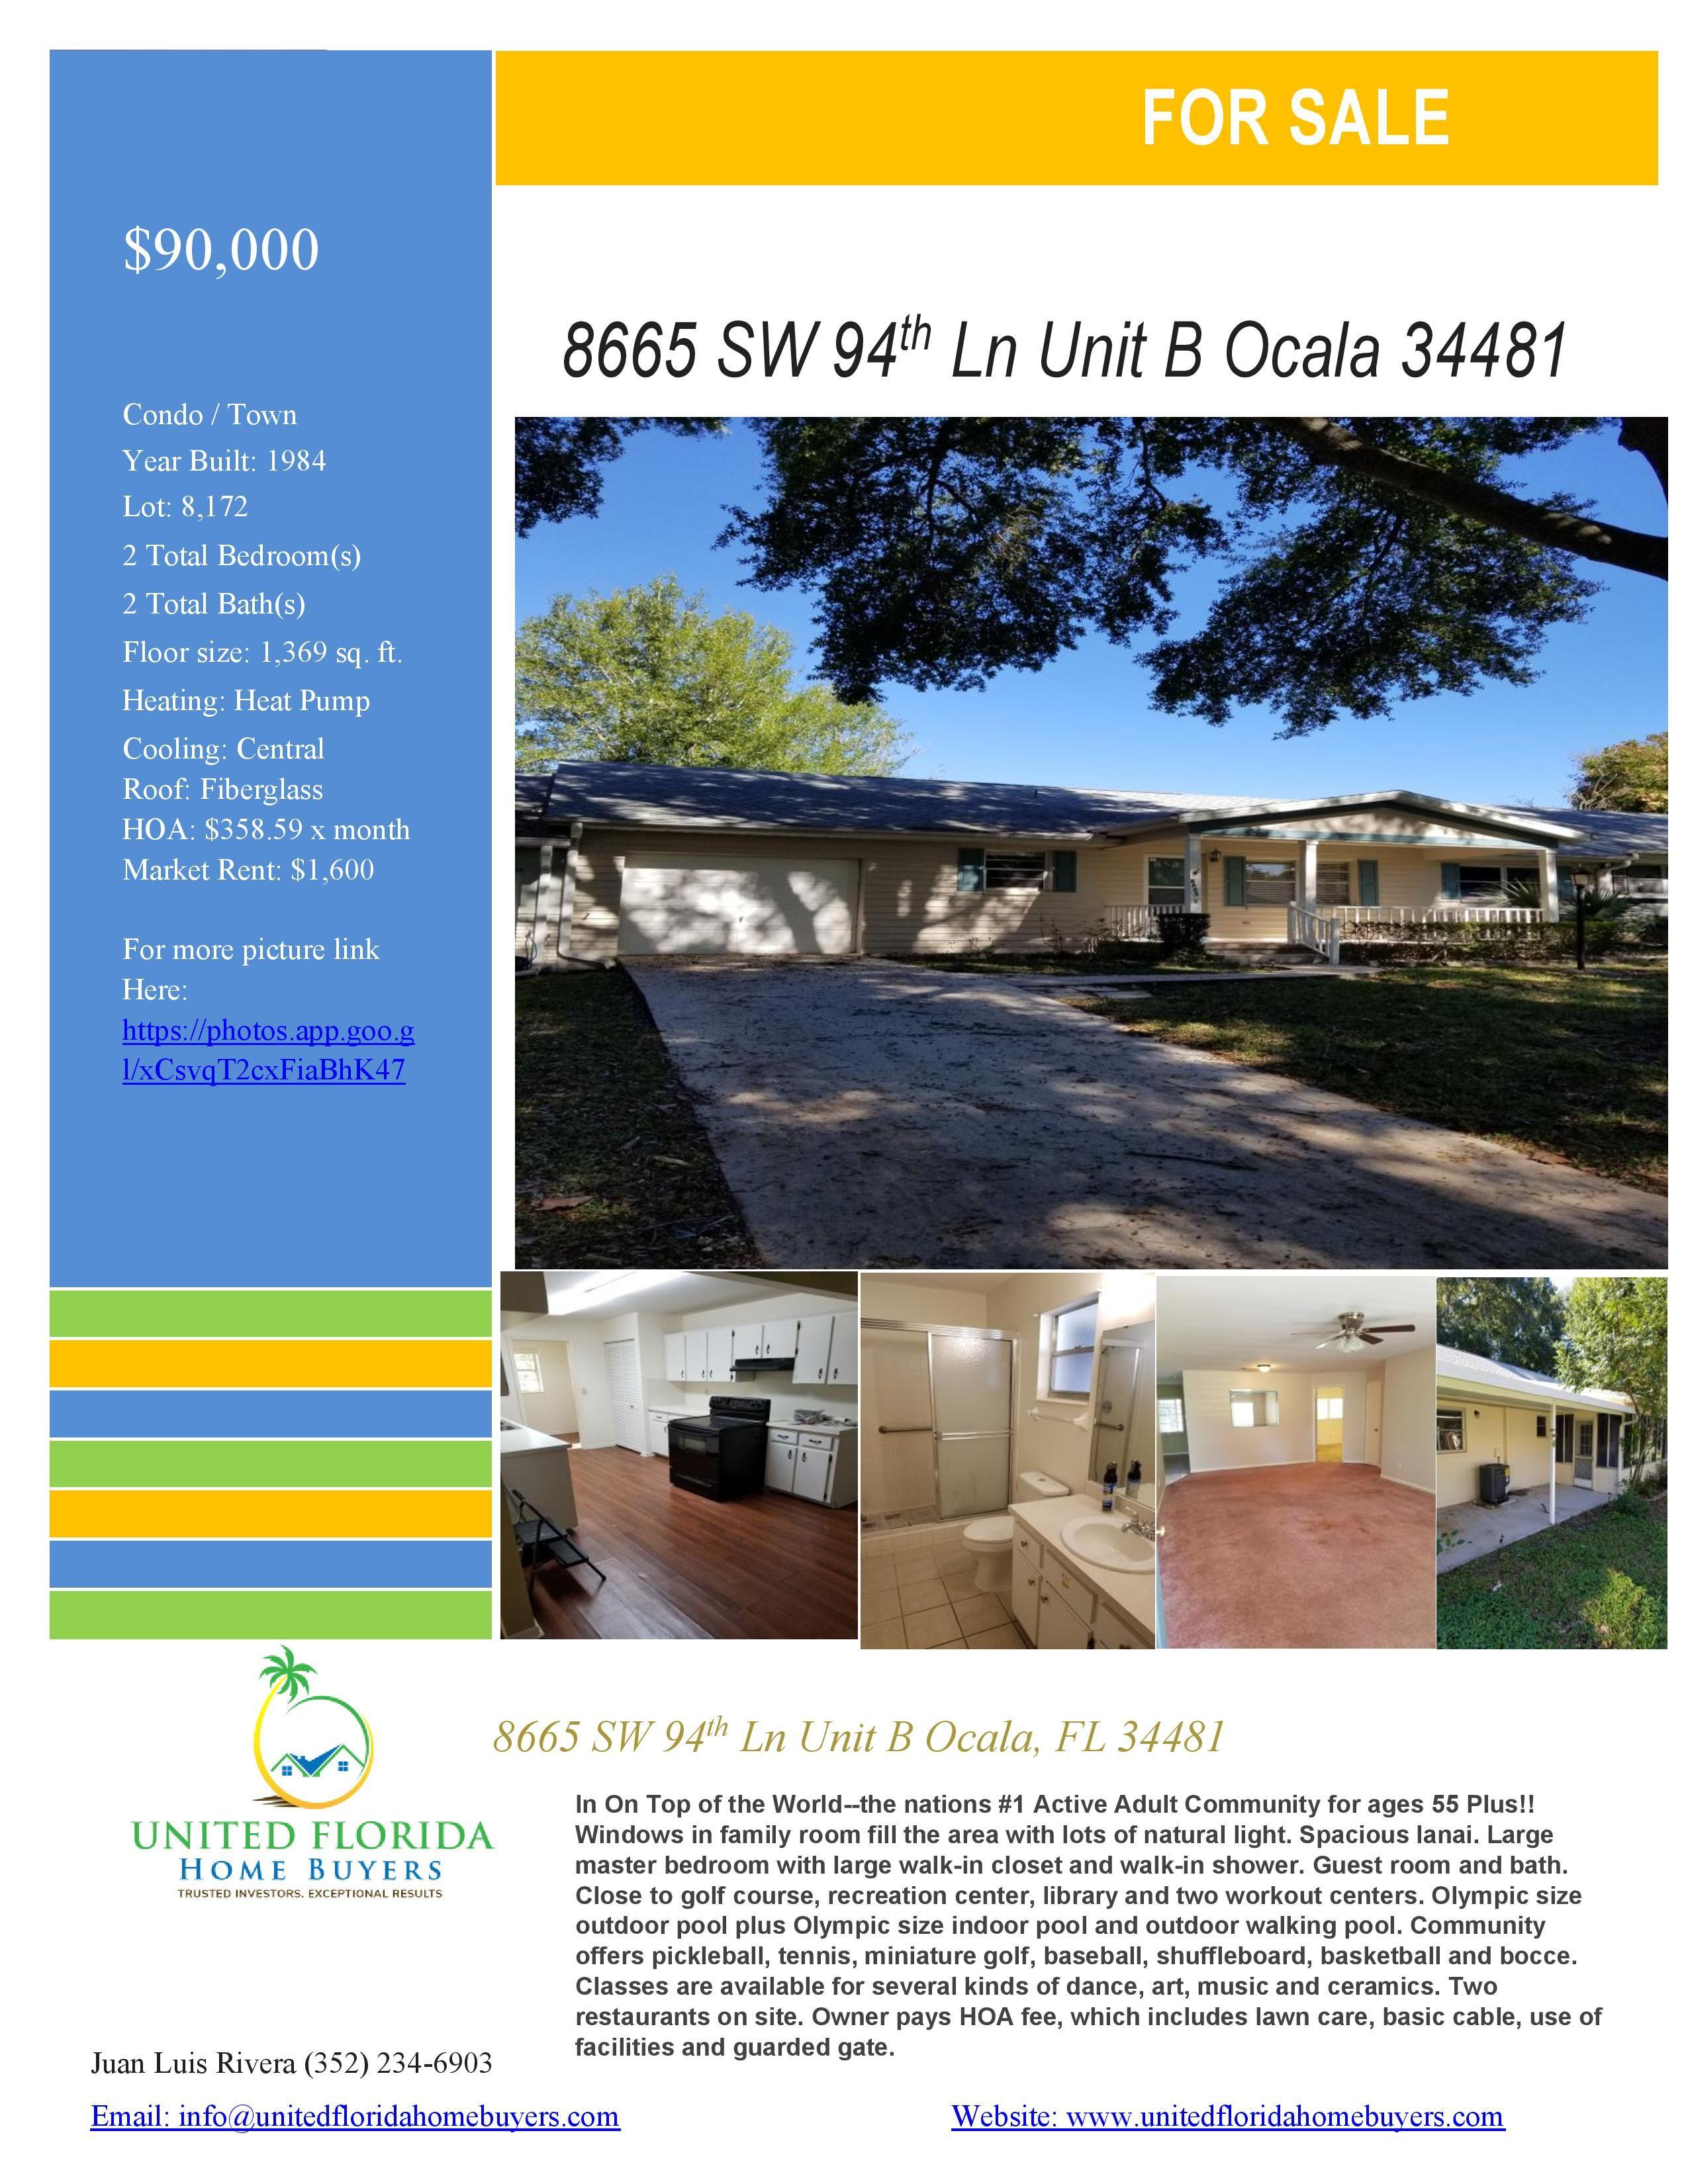 8665 SW 94th Ln Unit B, Ocala, FL